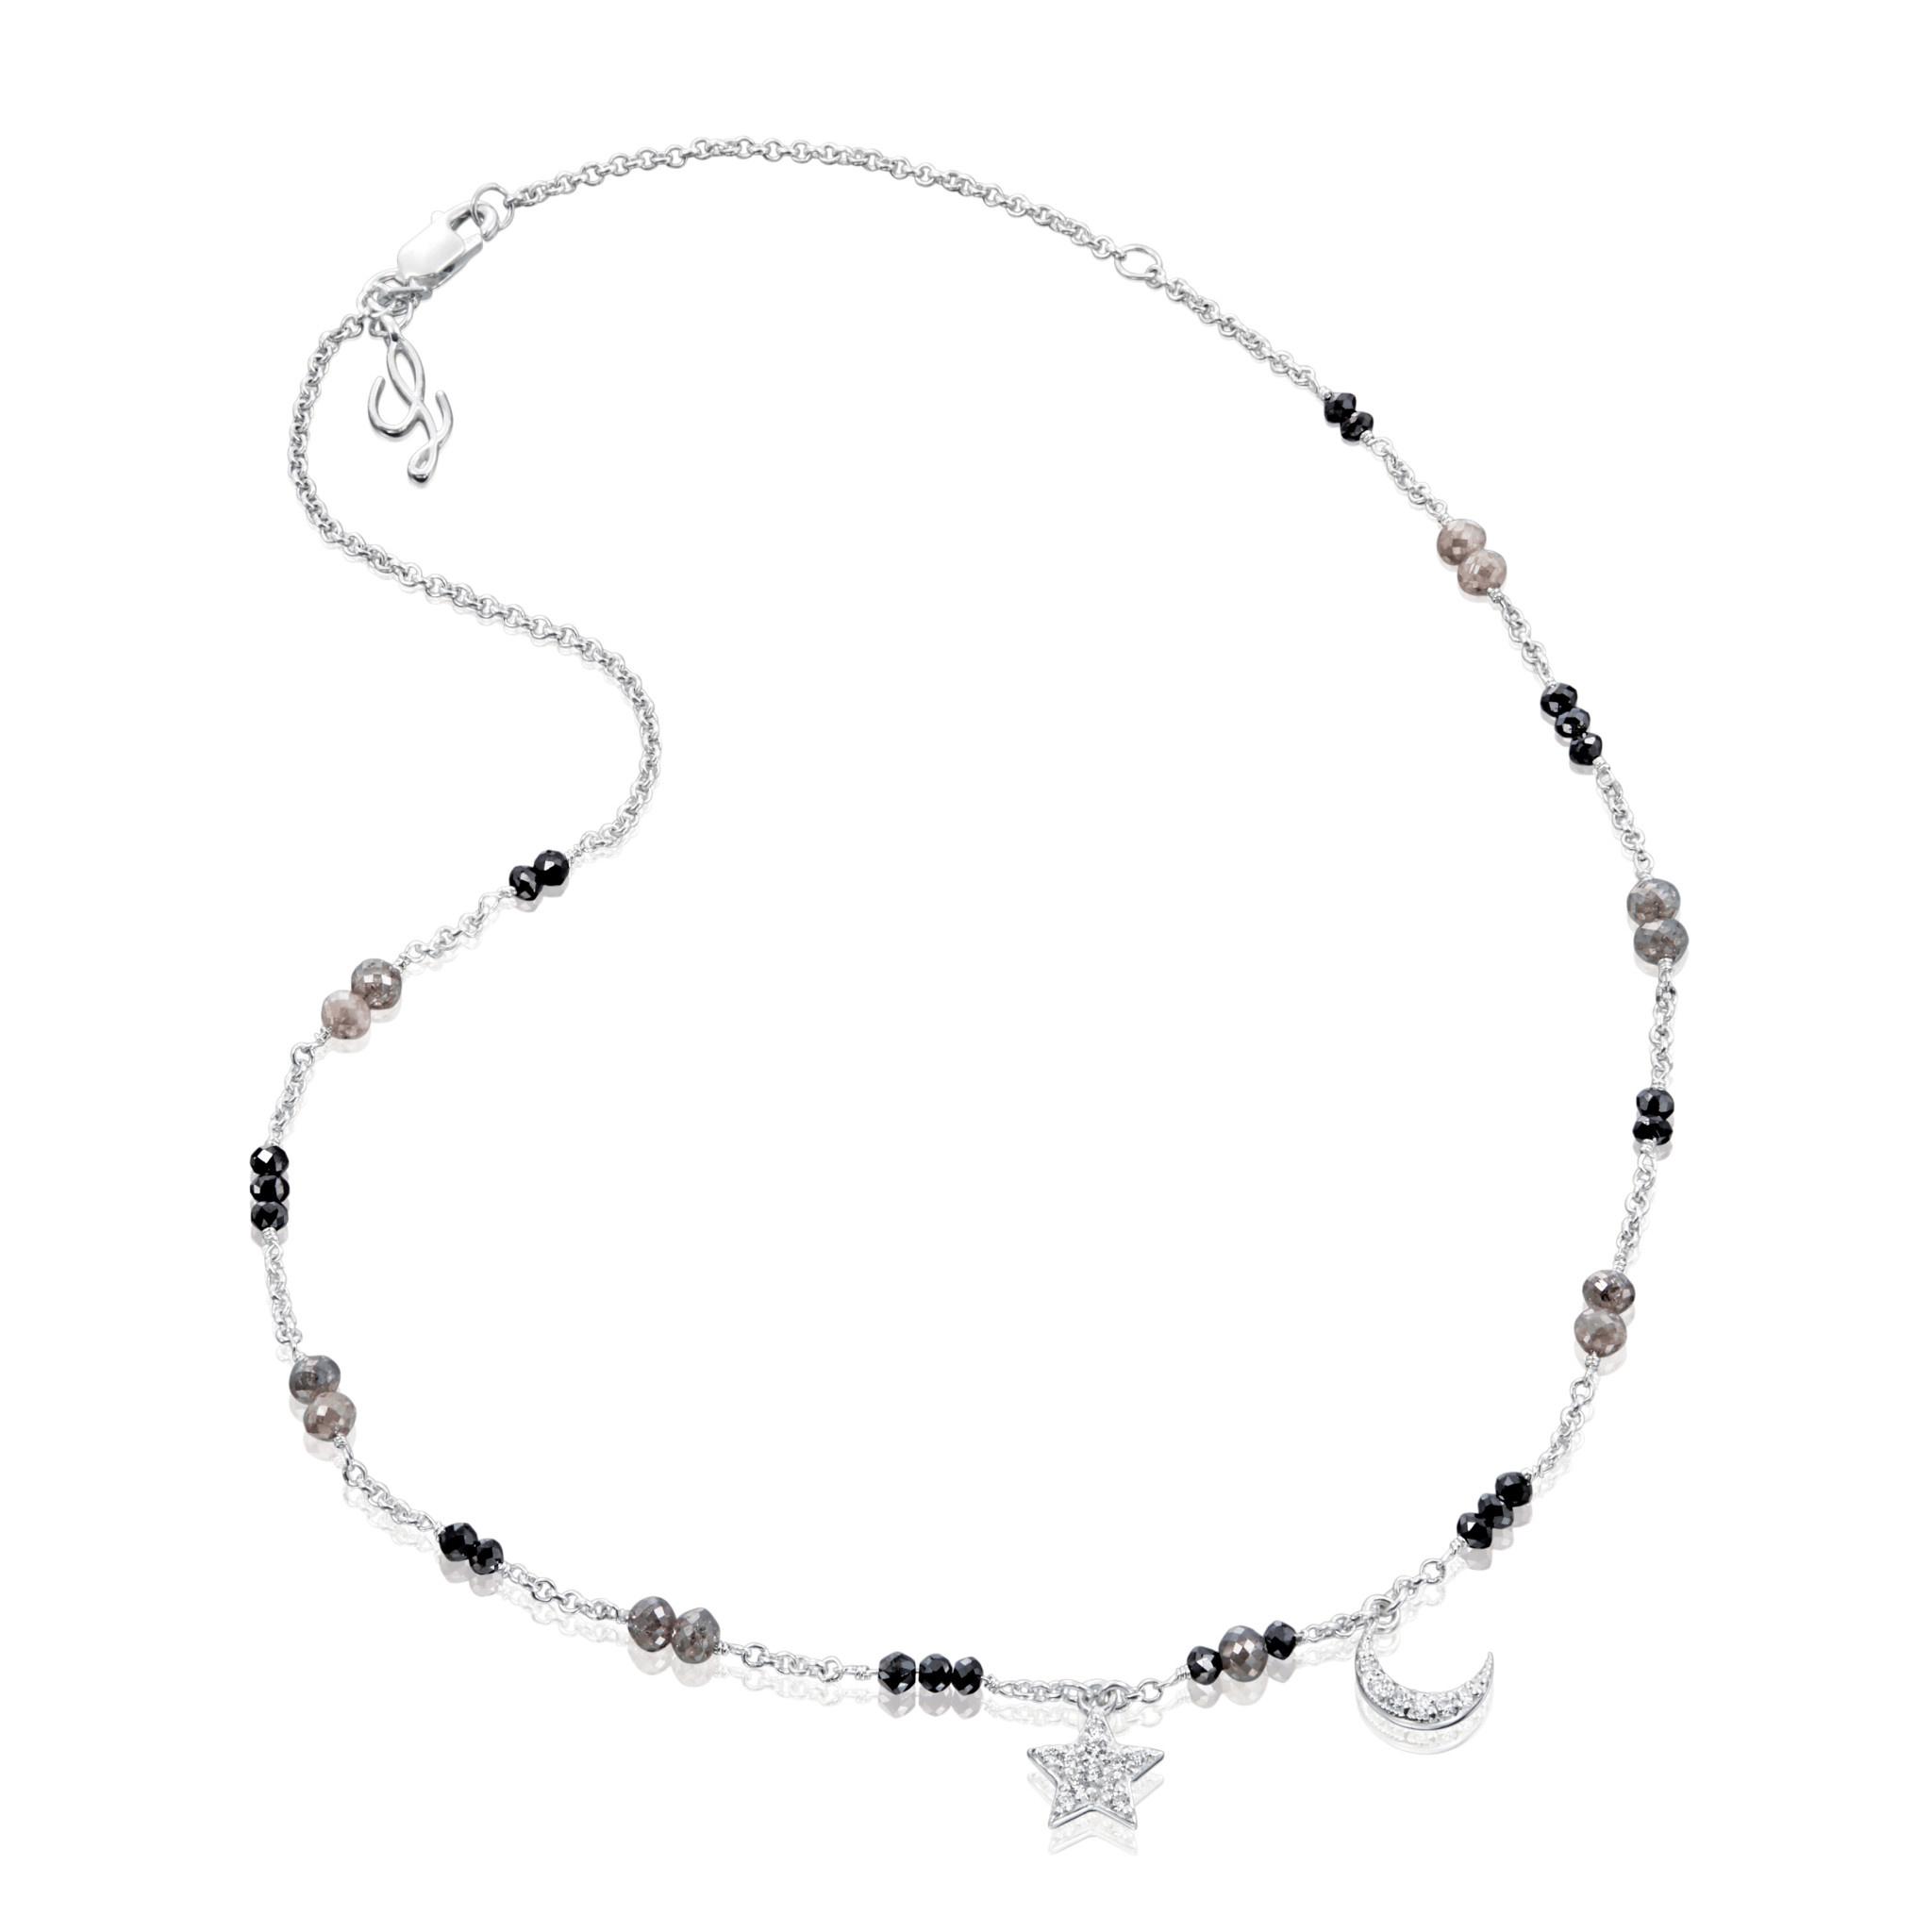 Misahara Night Sky Necklace